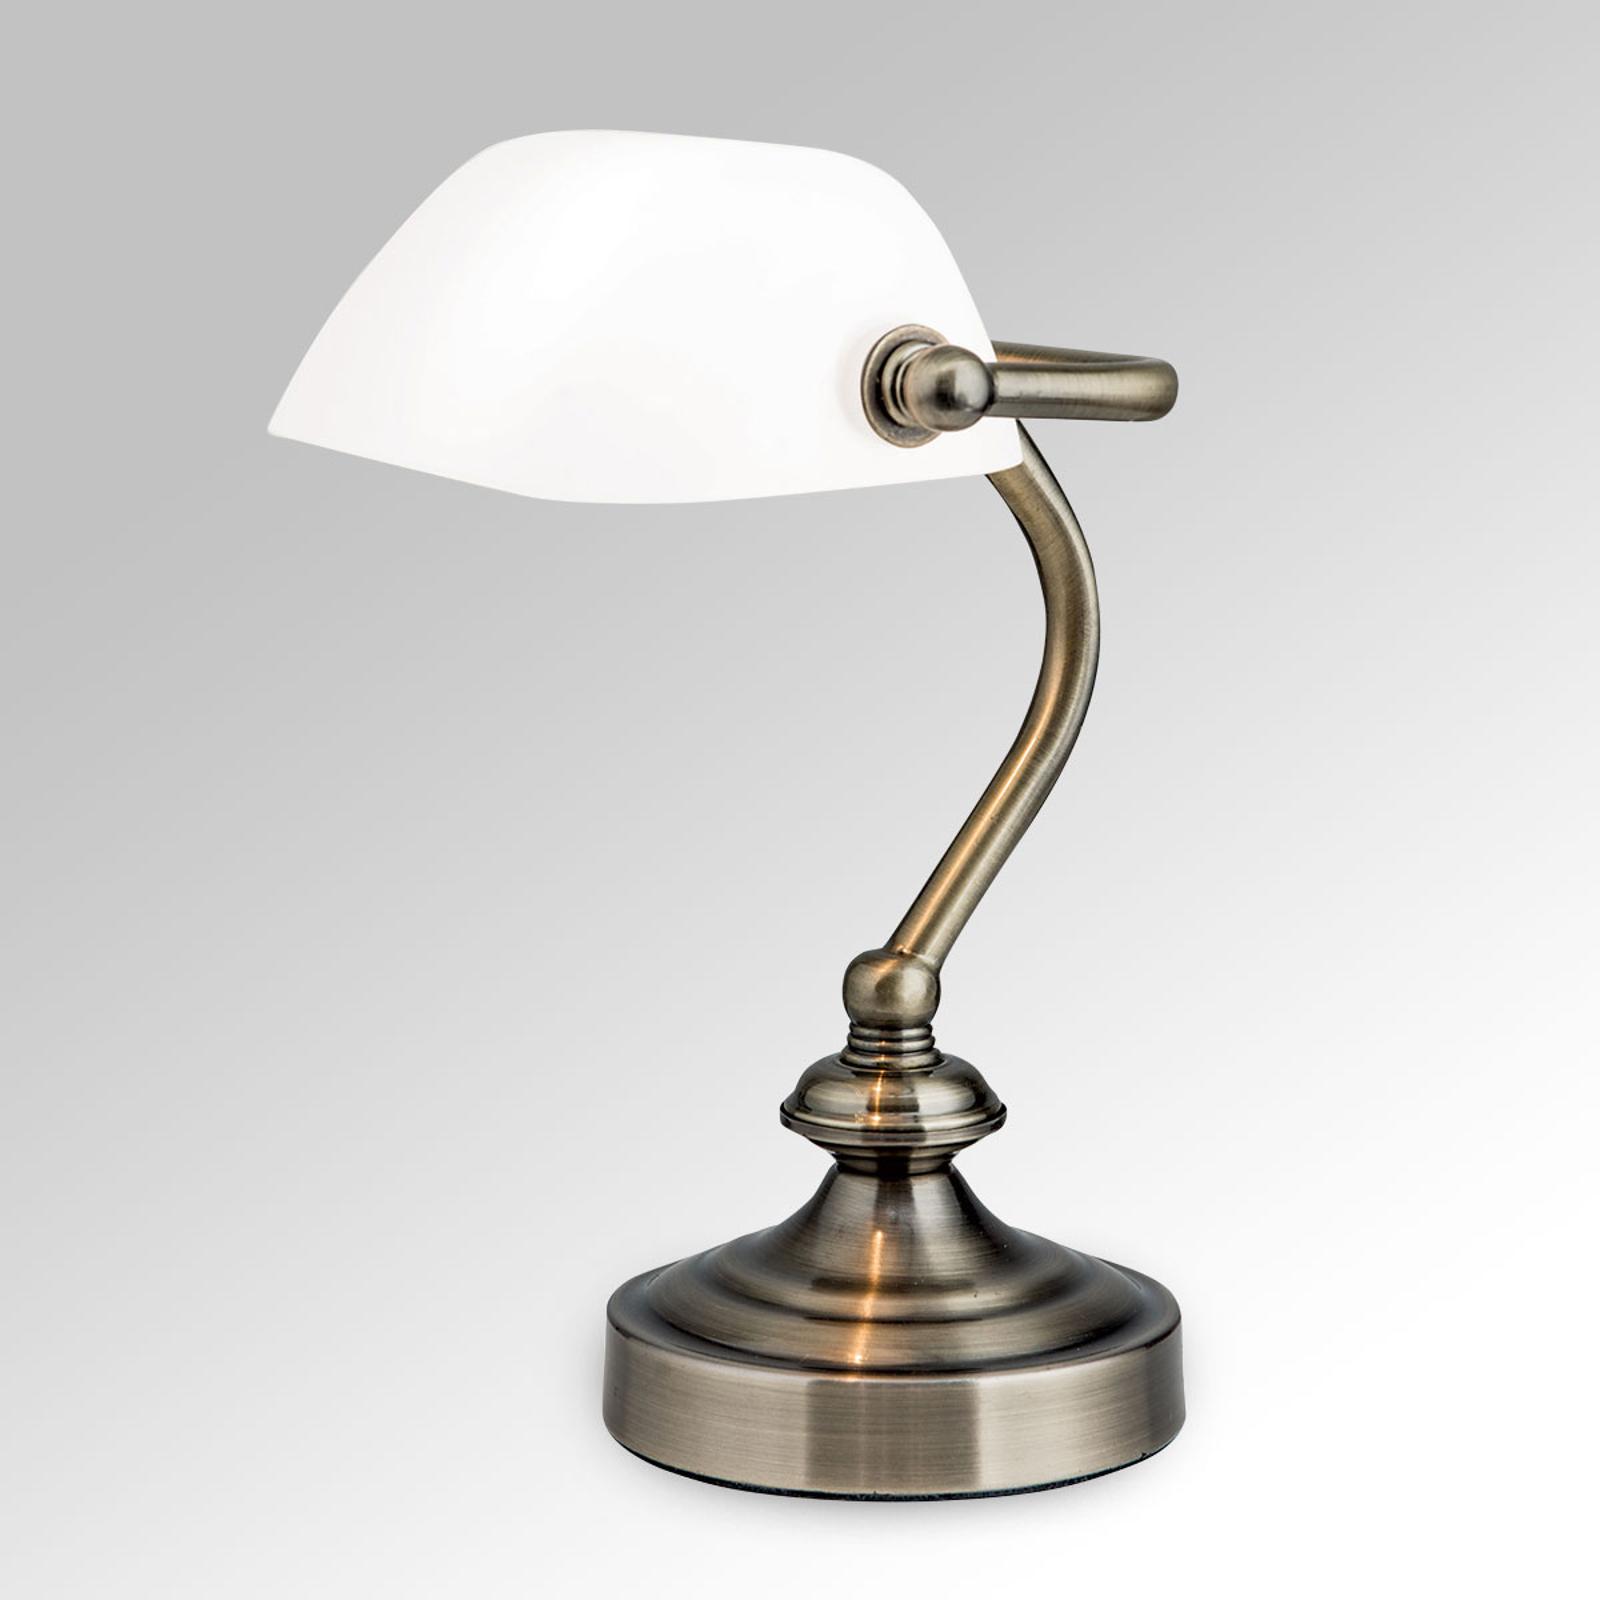 Klassieke bankier tafellamp Zora met glazen kap